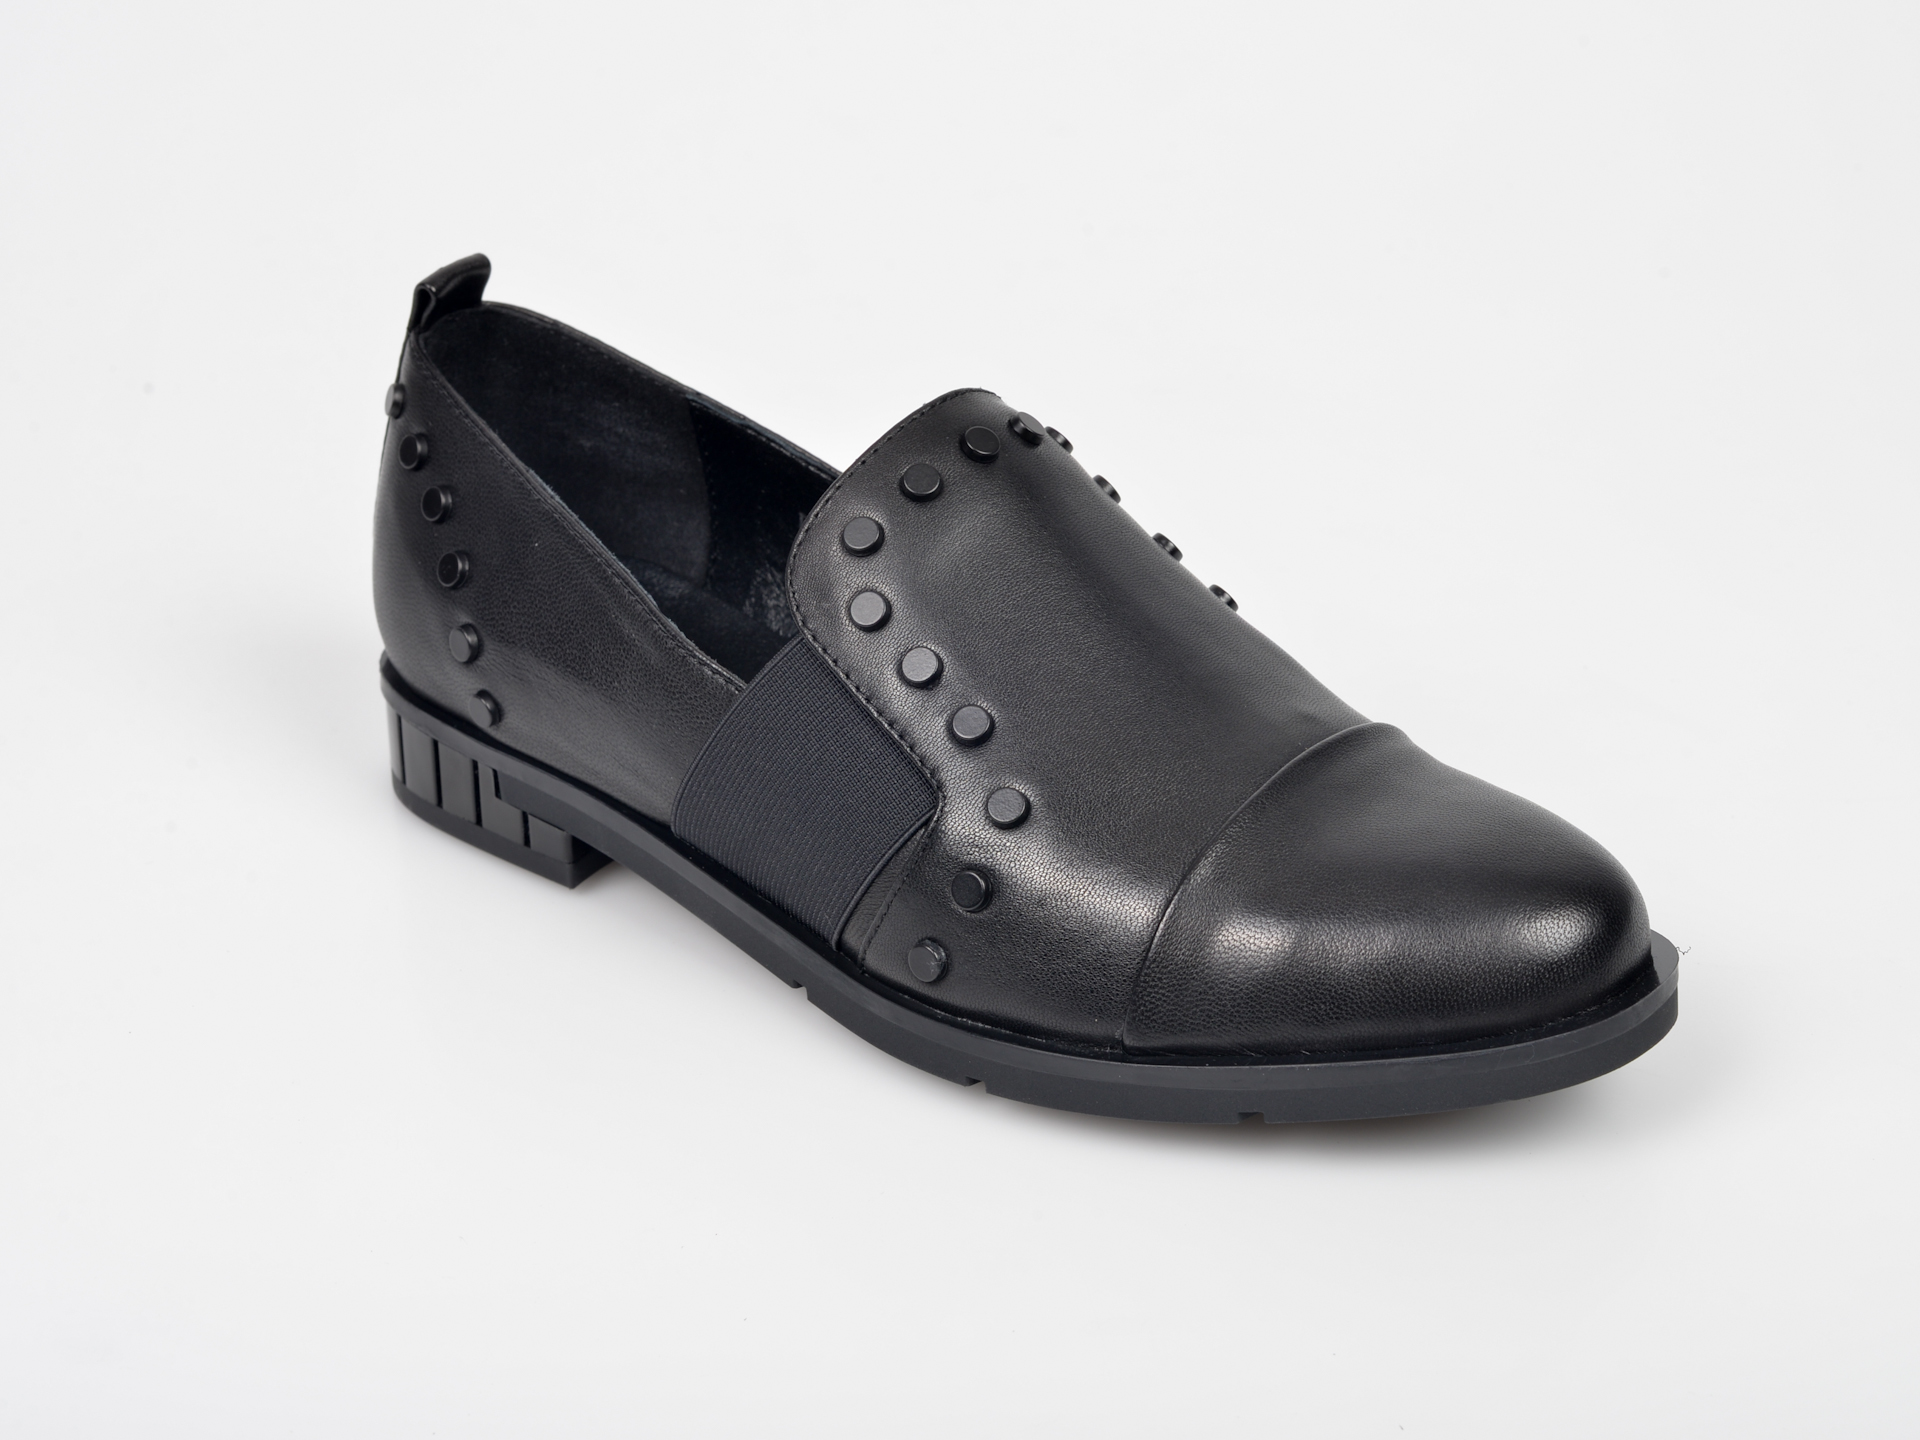 Pantofi 0 negri, Pantof Dama, din piele naturala